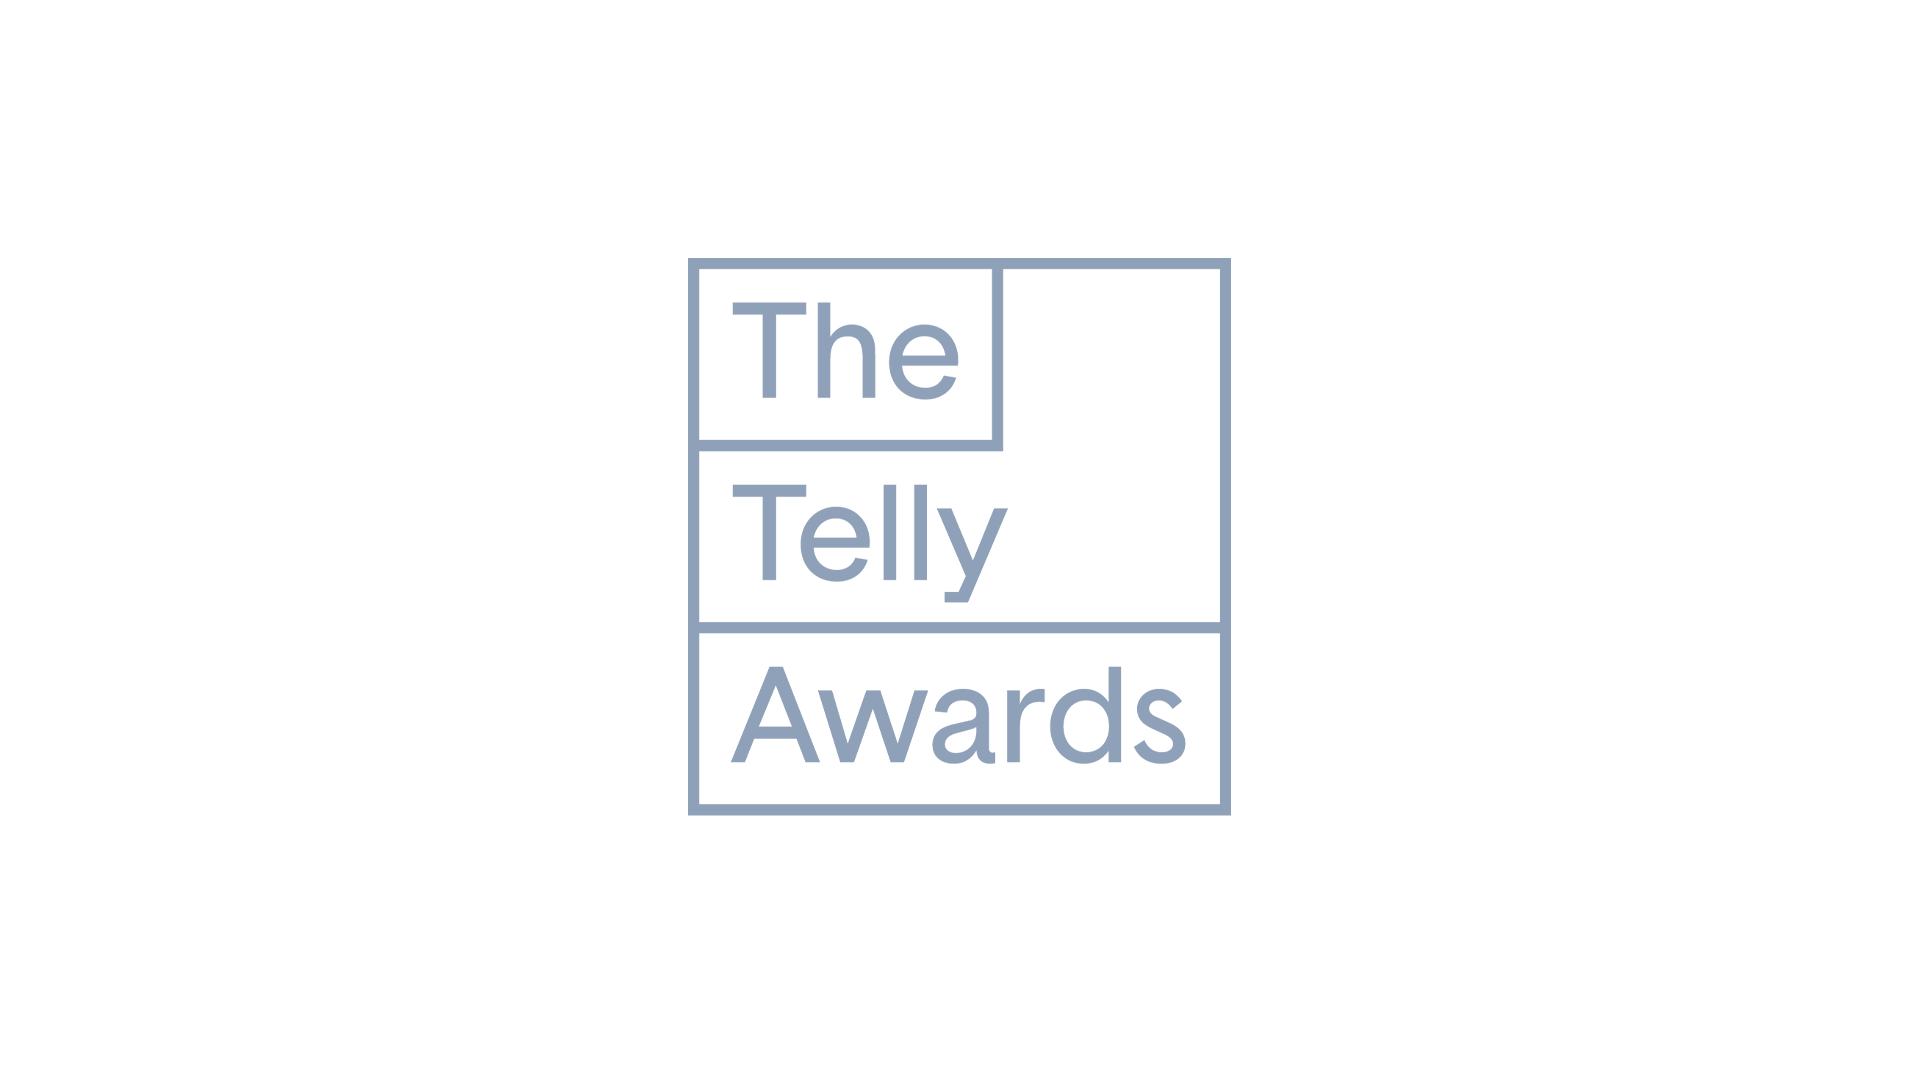 awards_logo_06